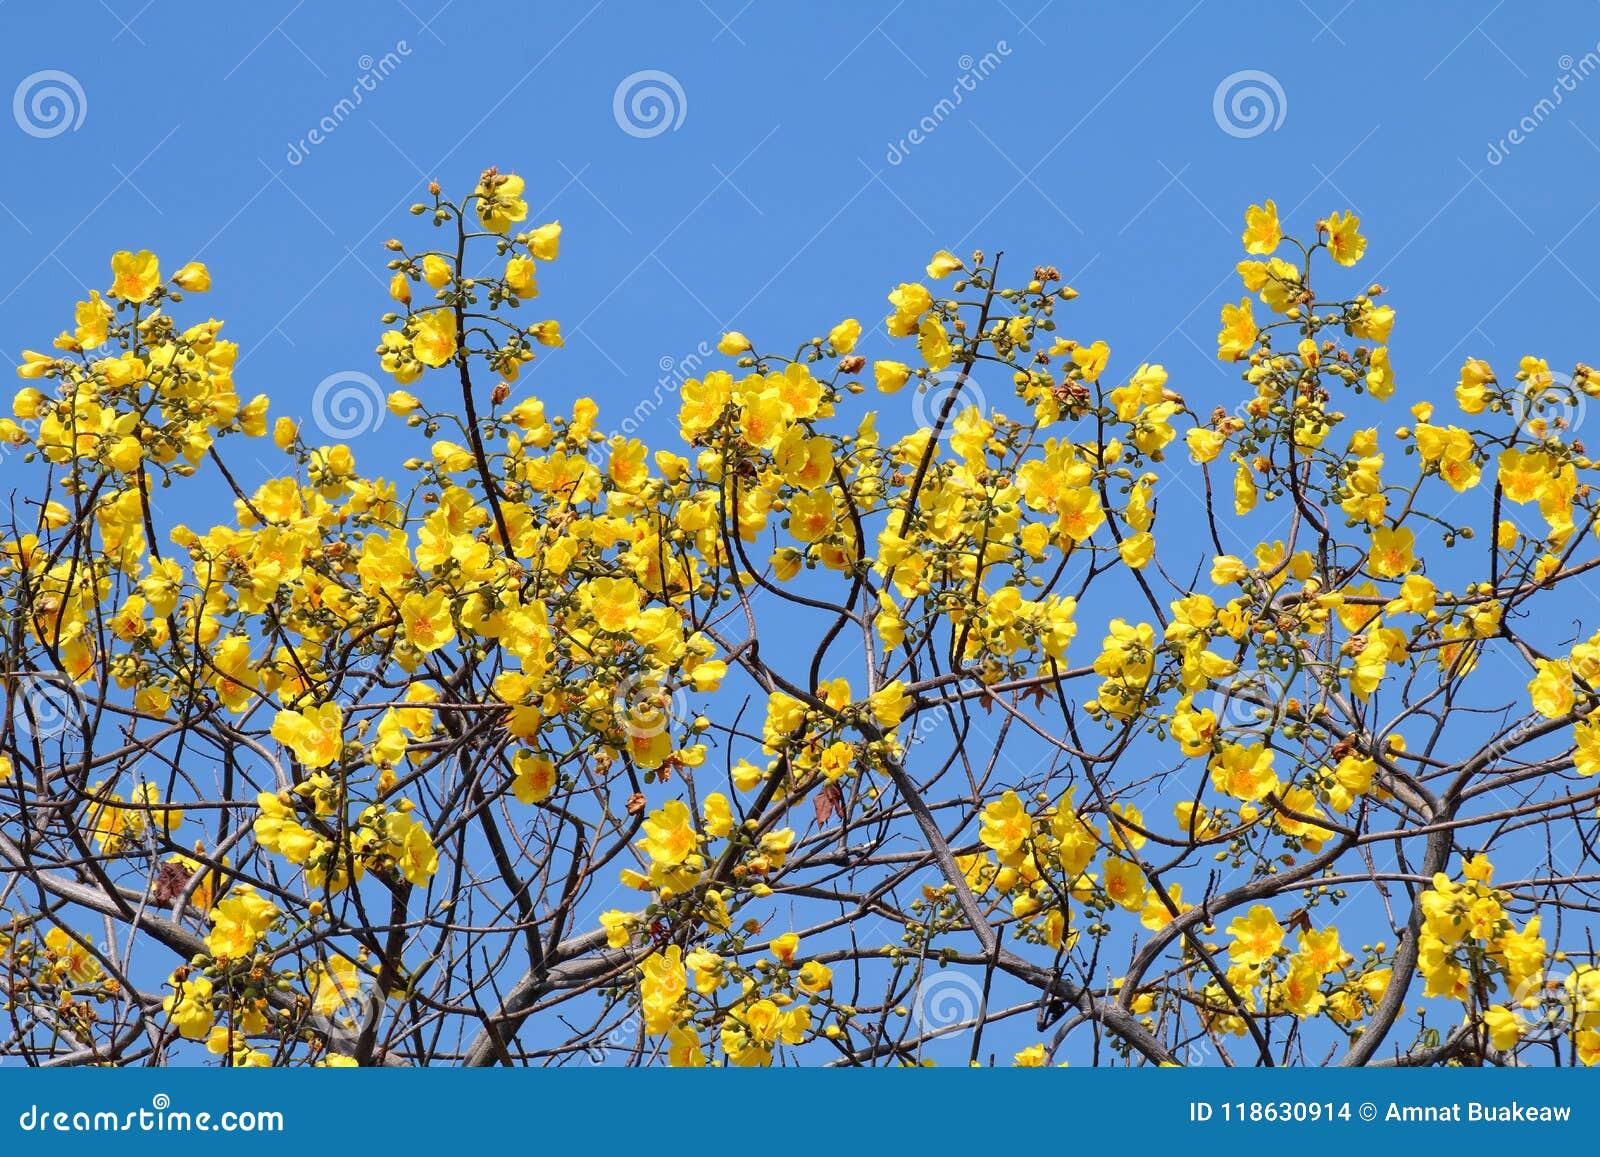 Yellow Cotton Flower Tree Flowers On Sky Blue Background Scientific